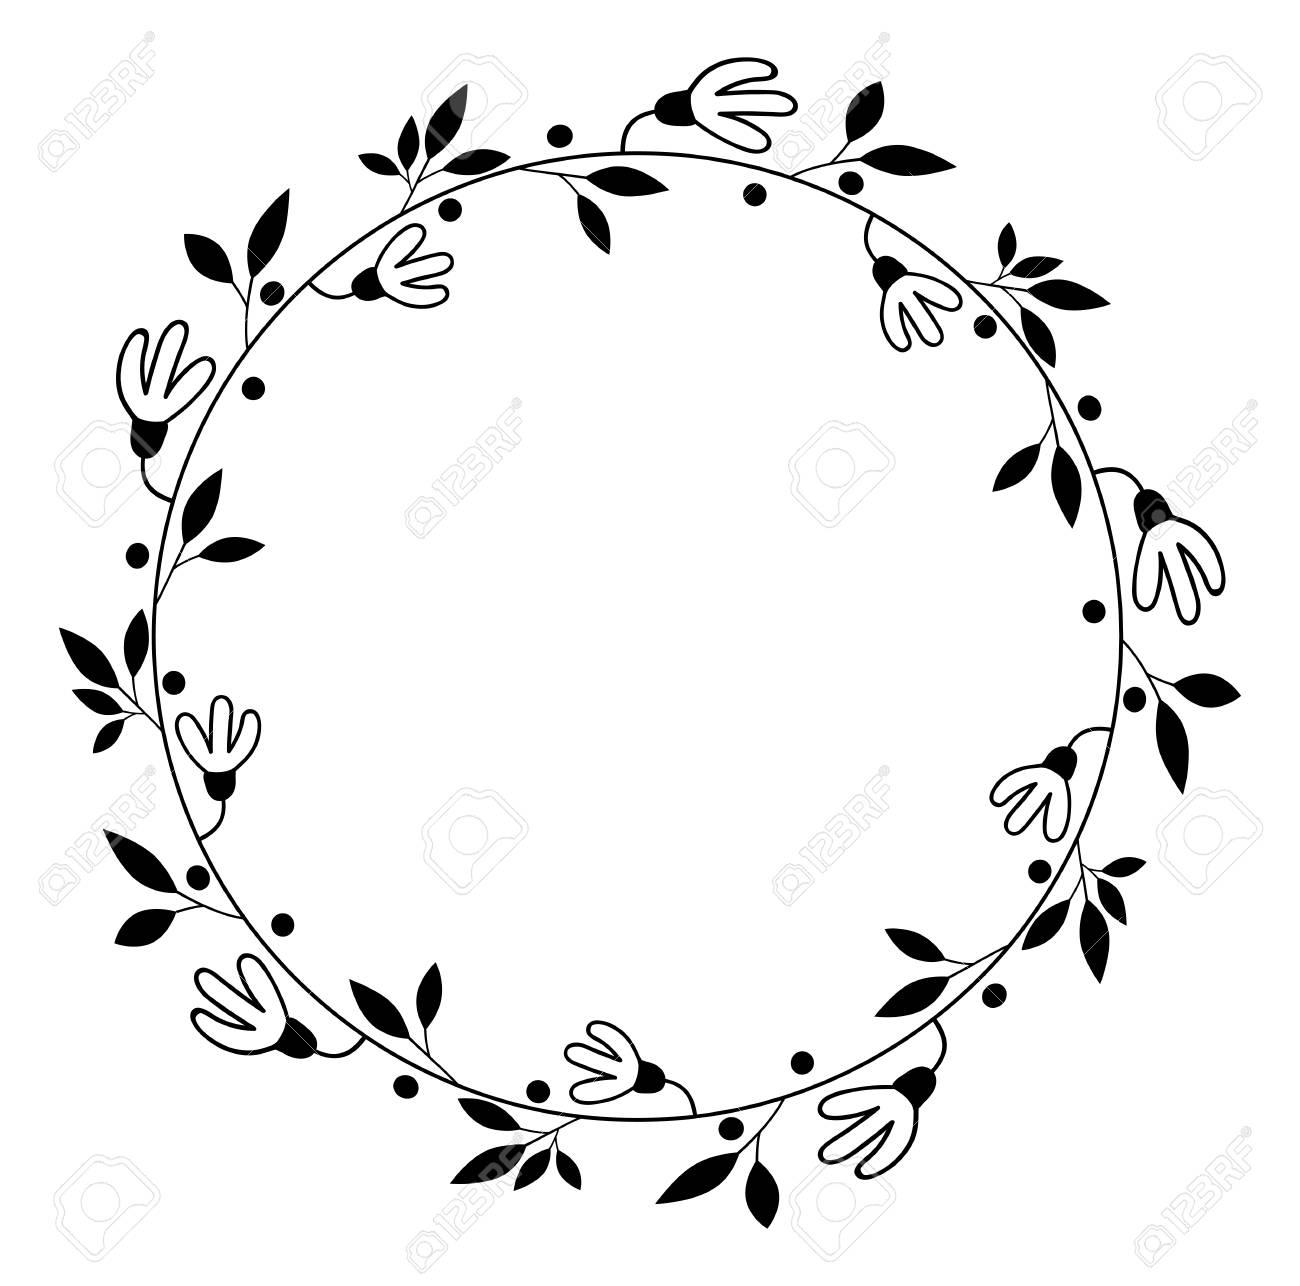 Round Vector Floral Wreath Black Flower Border For Wedding